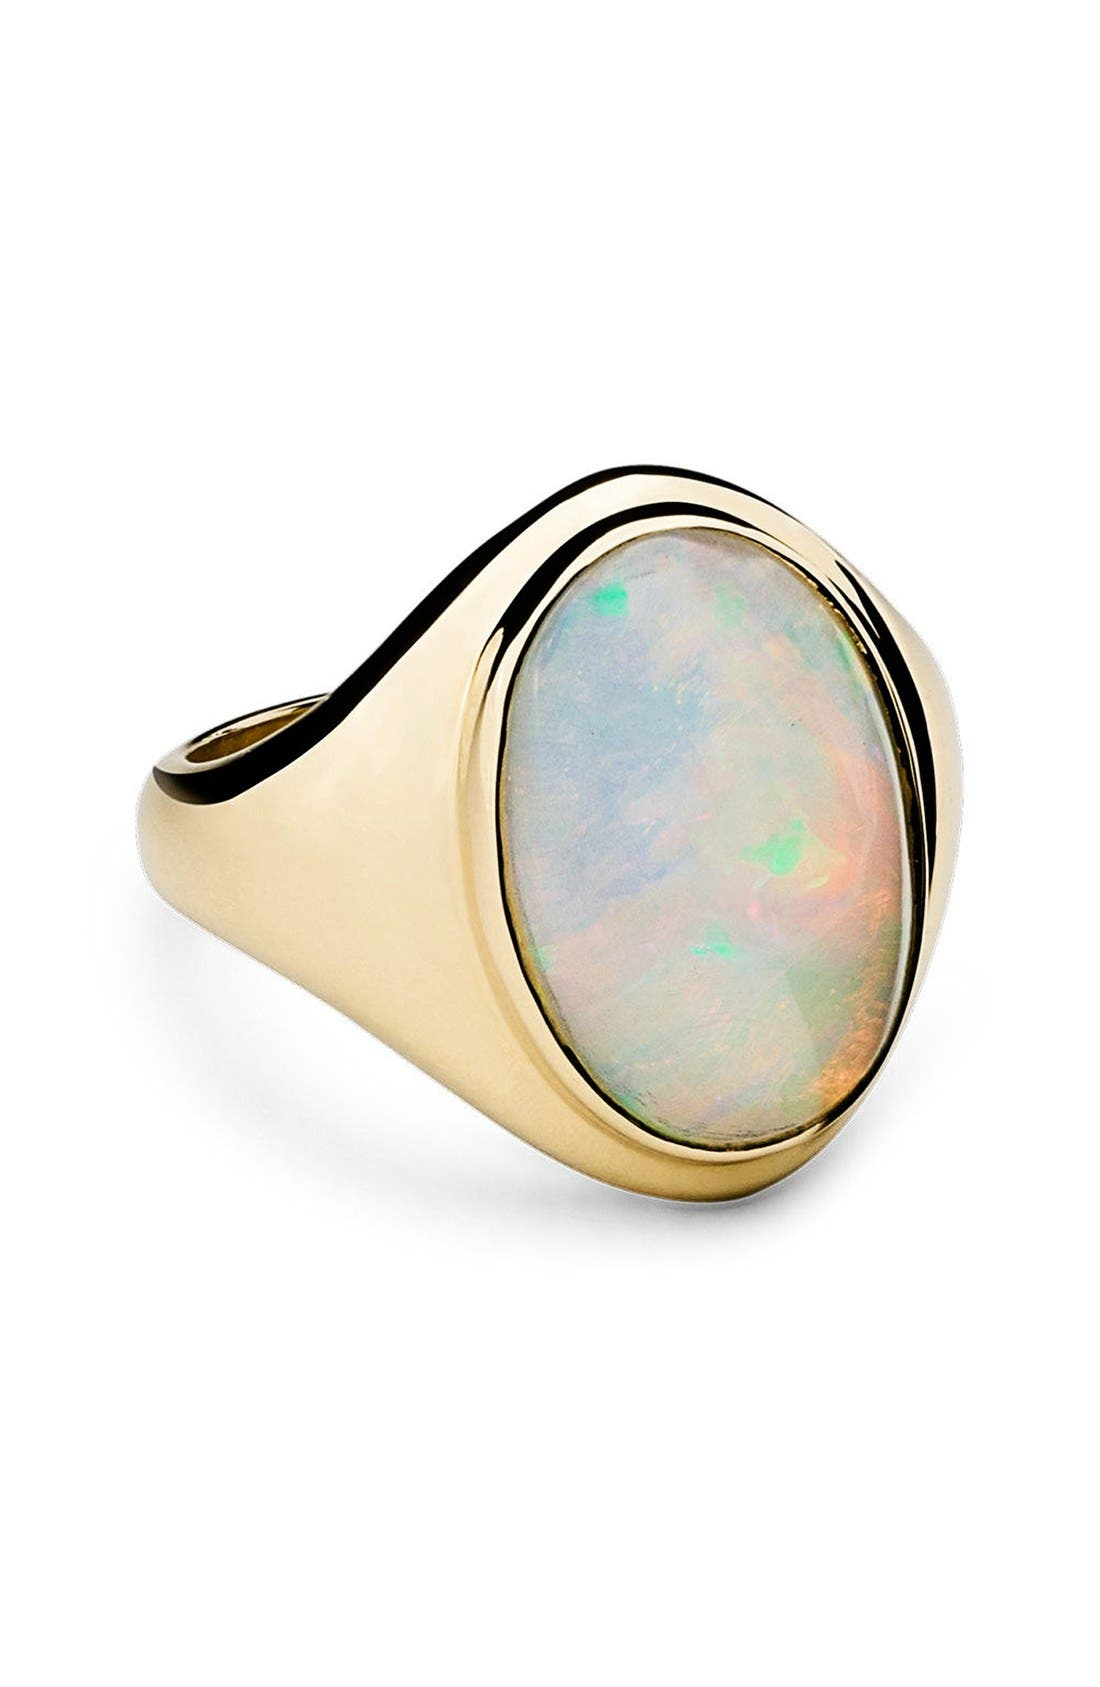 Main Image - Shinola Opal Signet Ring